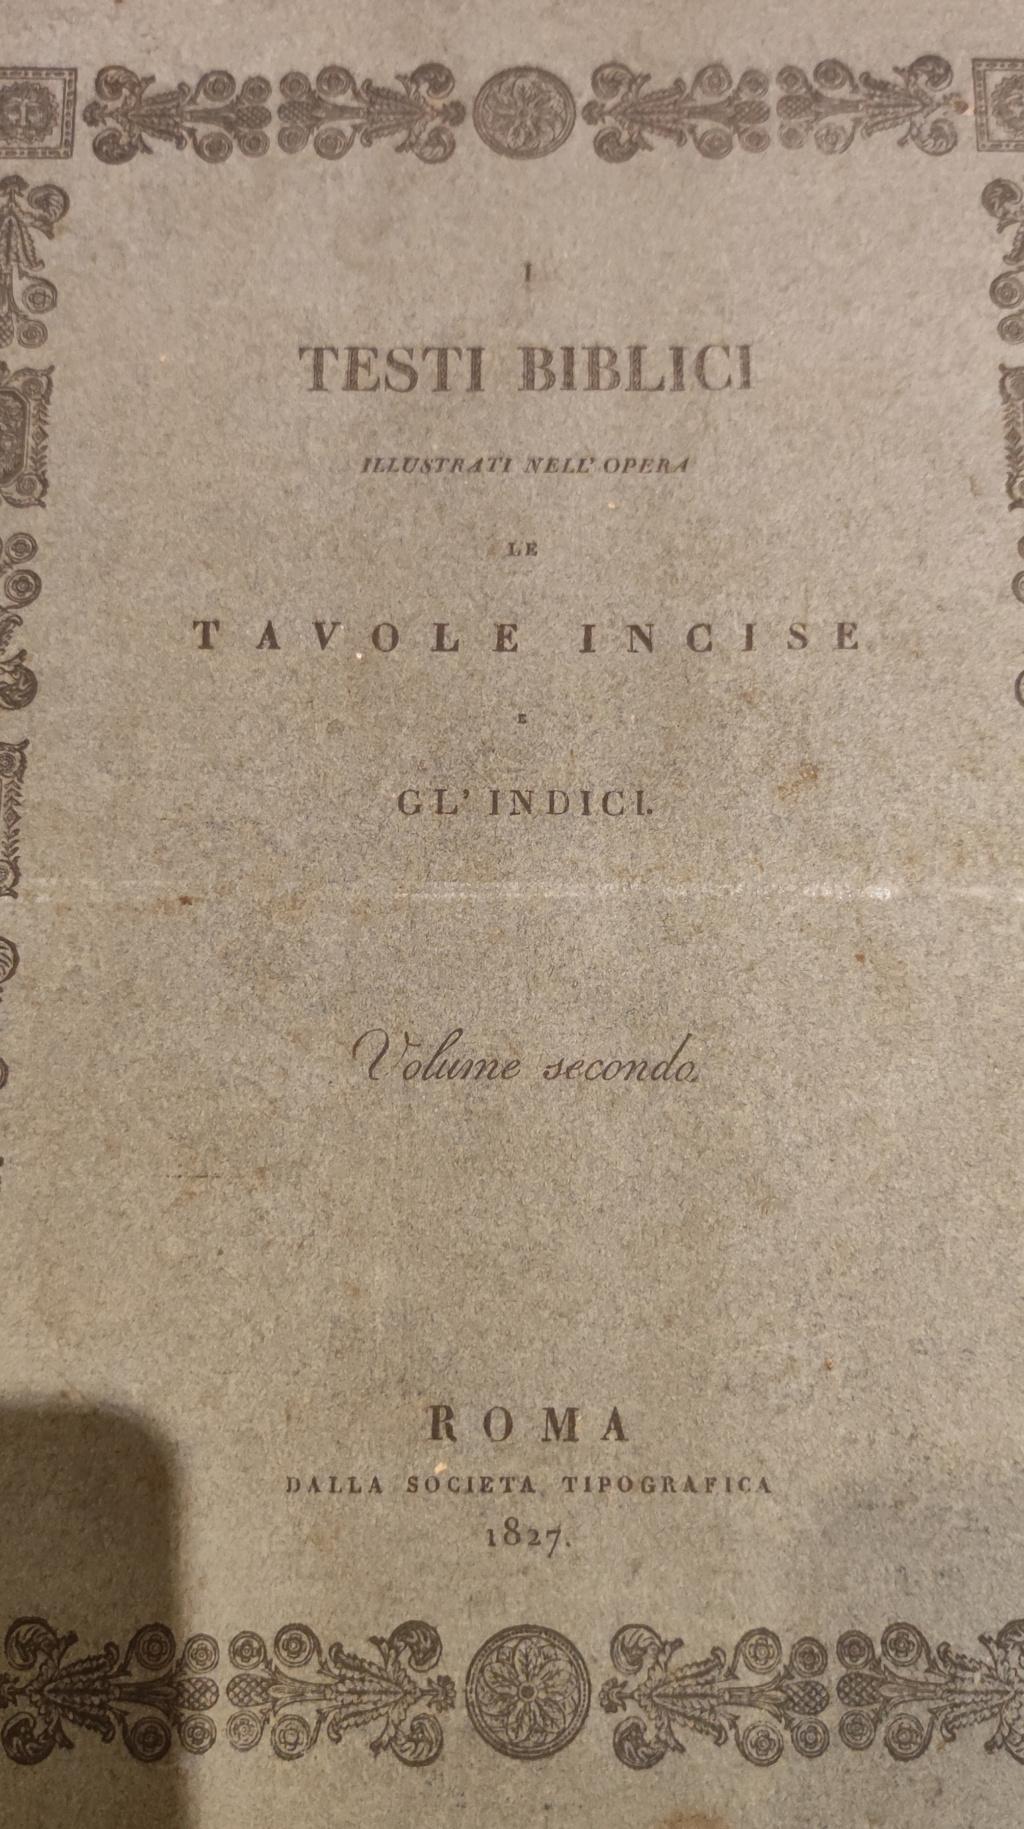 testi biblici illustrati nell'opera 1827 Img_2140